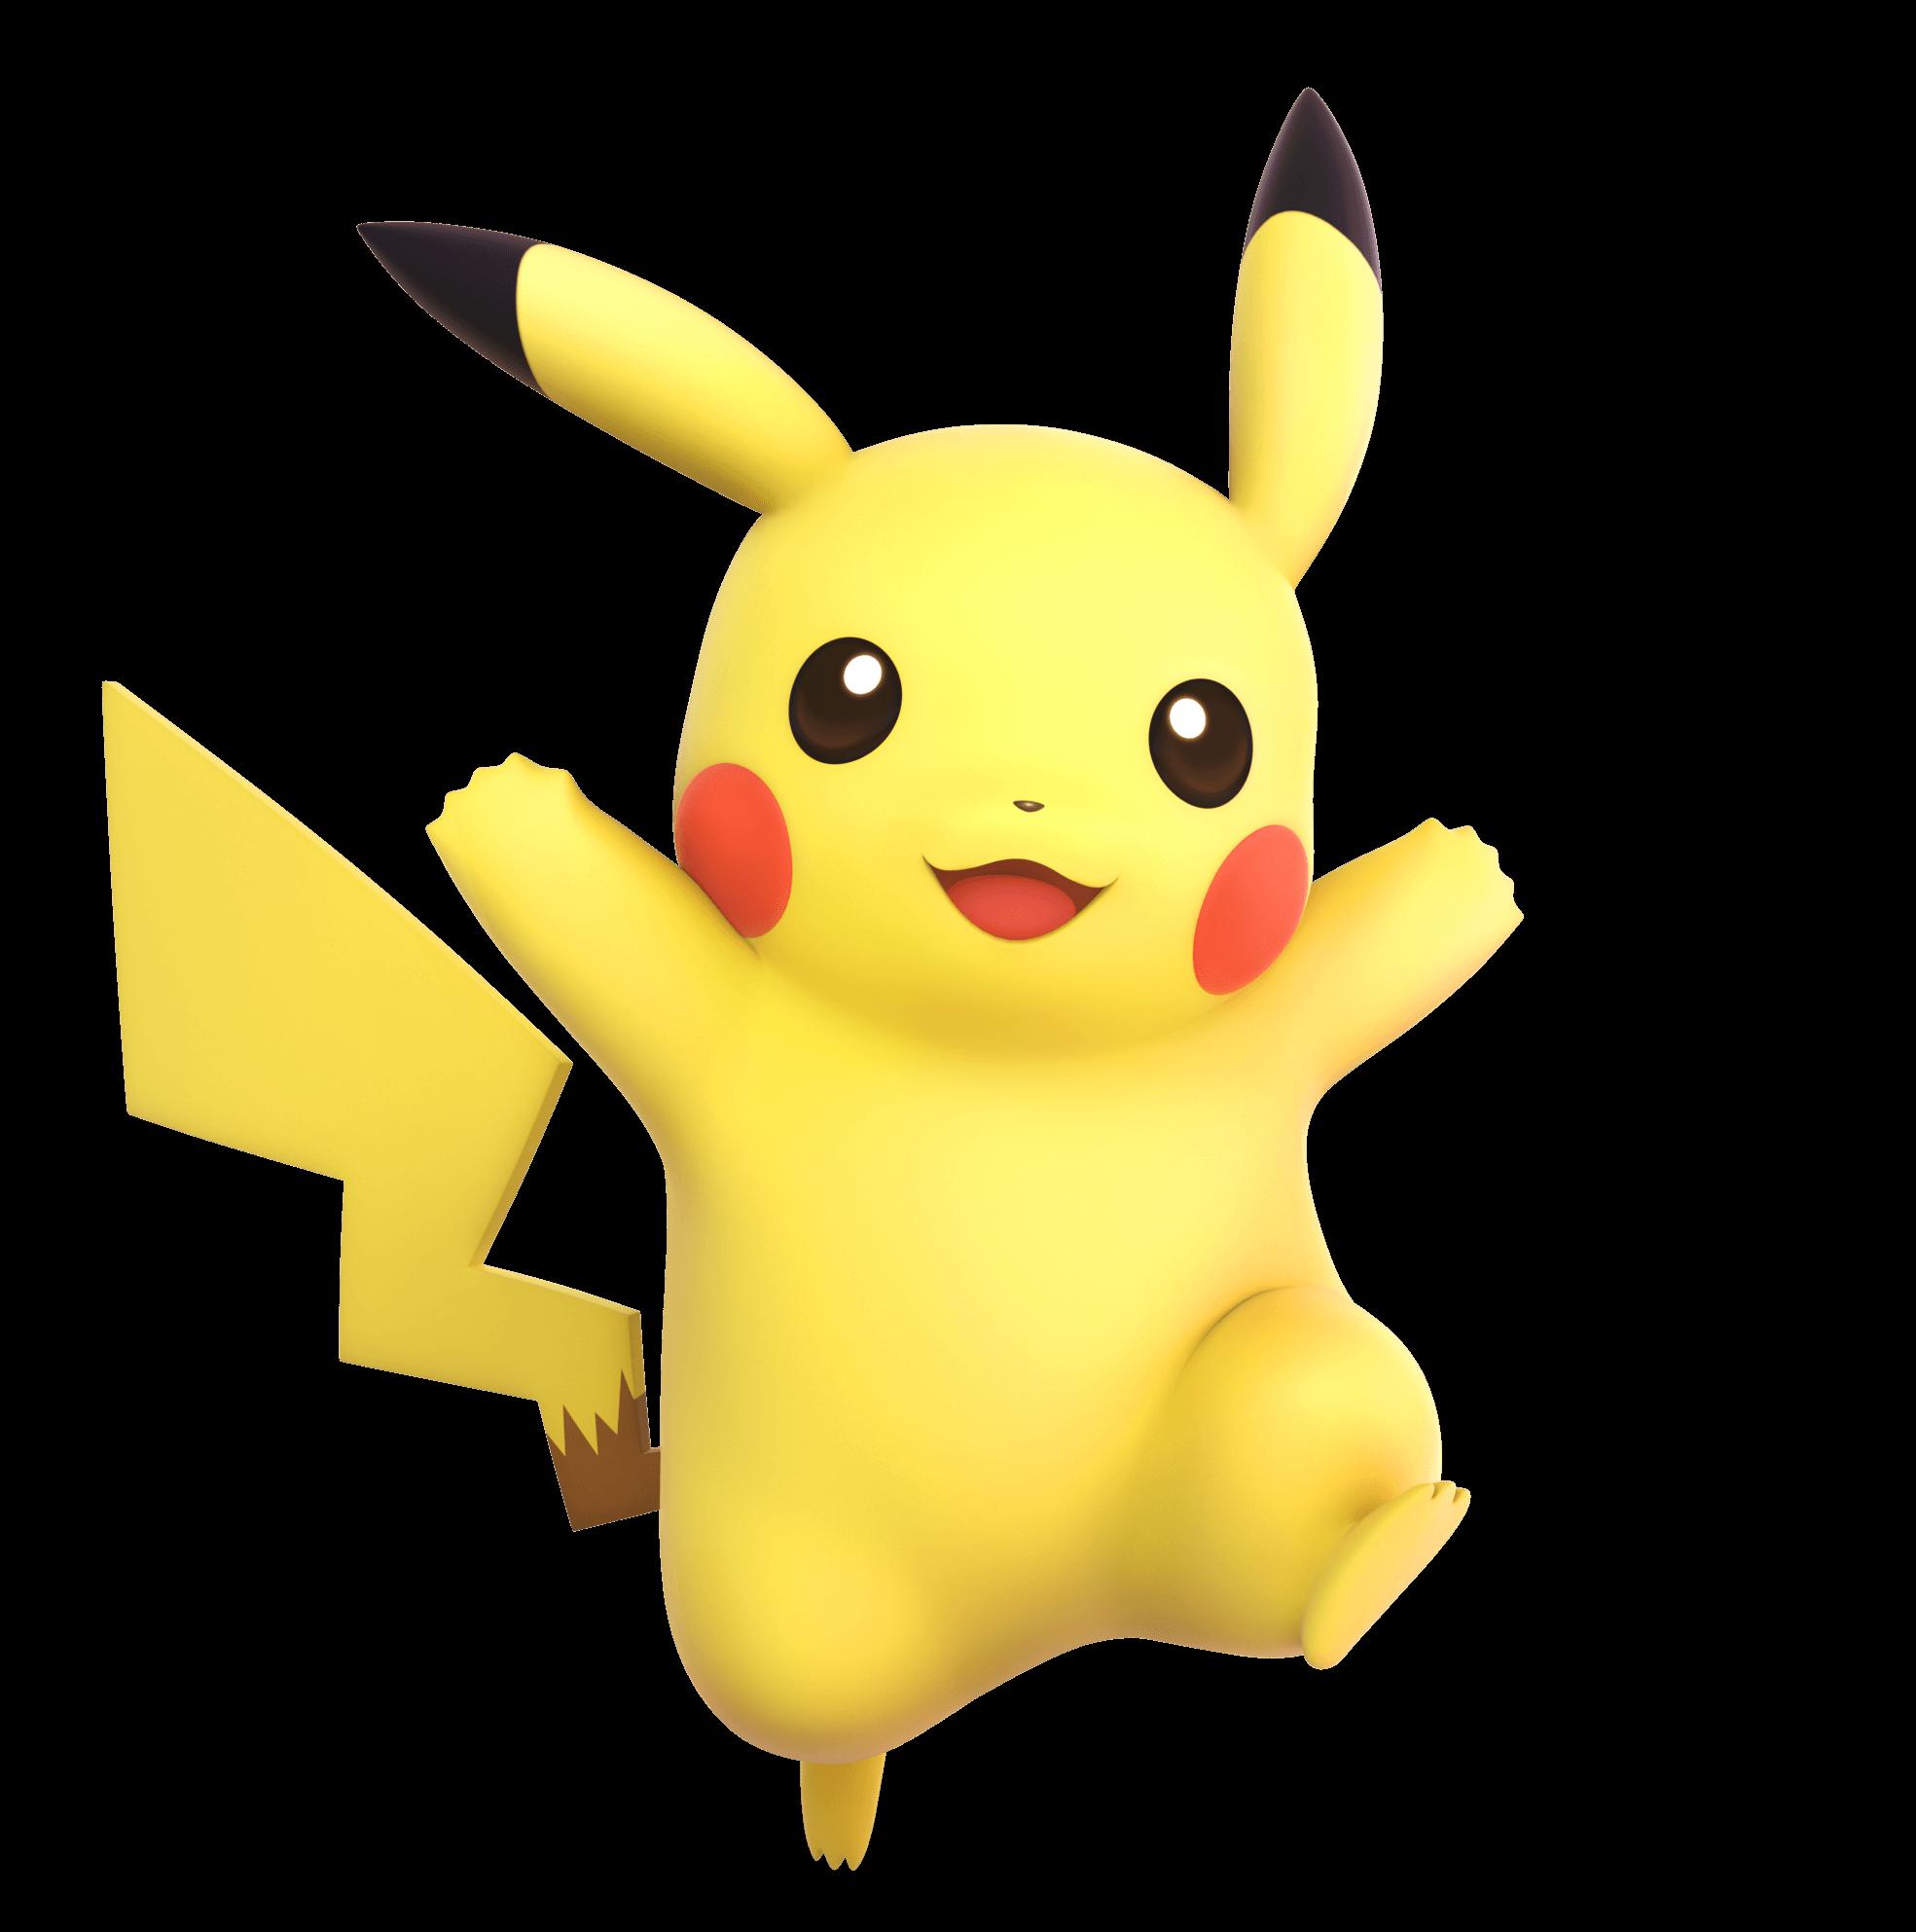 Pikachu Free Vector Png